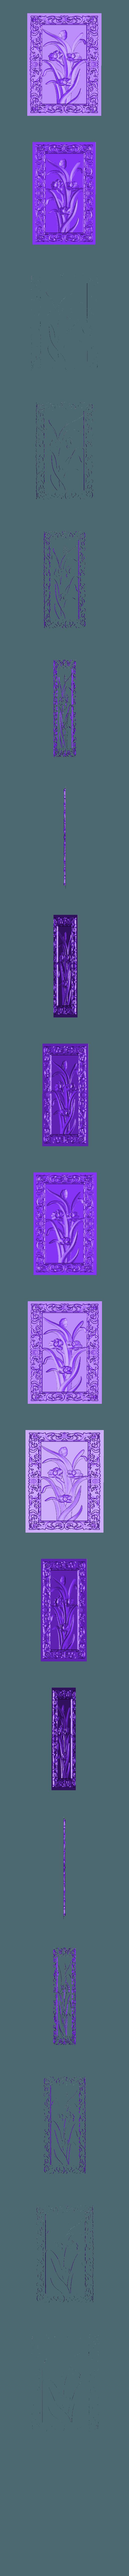 Flower.stl Download free STL file Flower • 3D printable model, Account-Closed